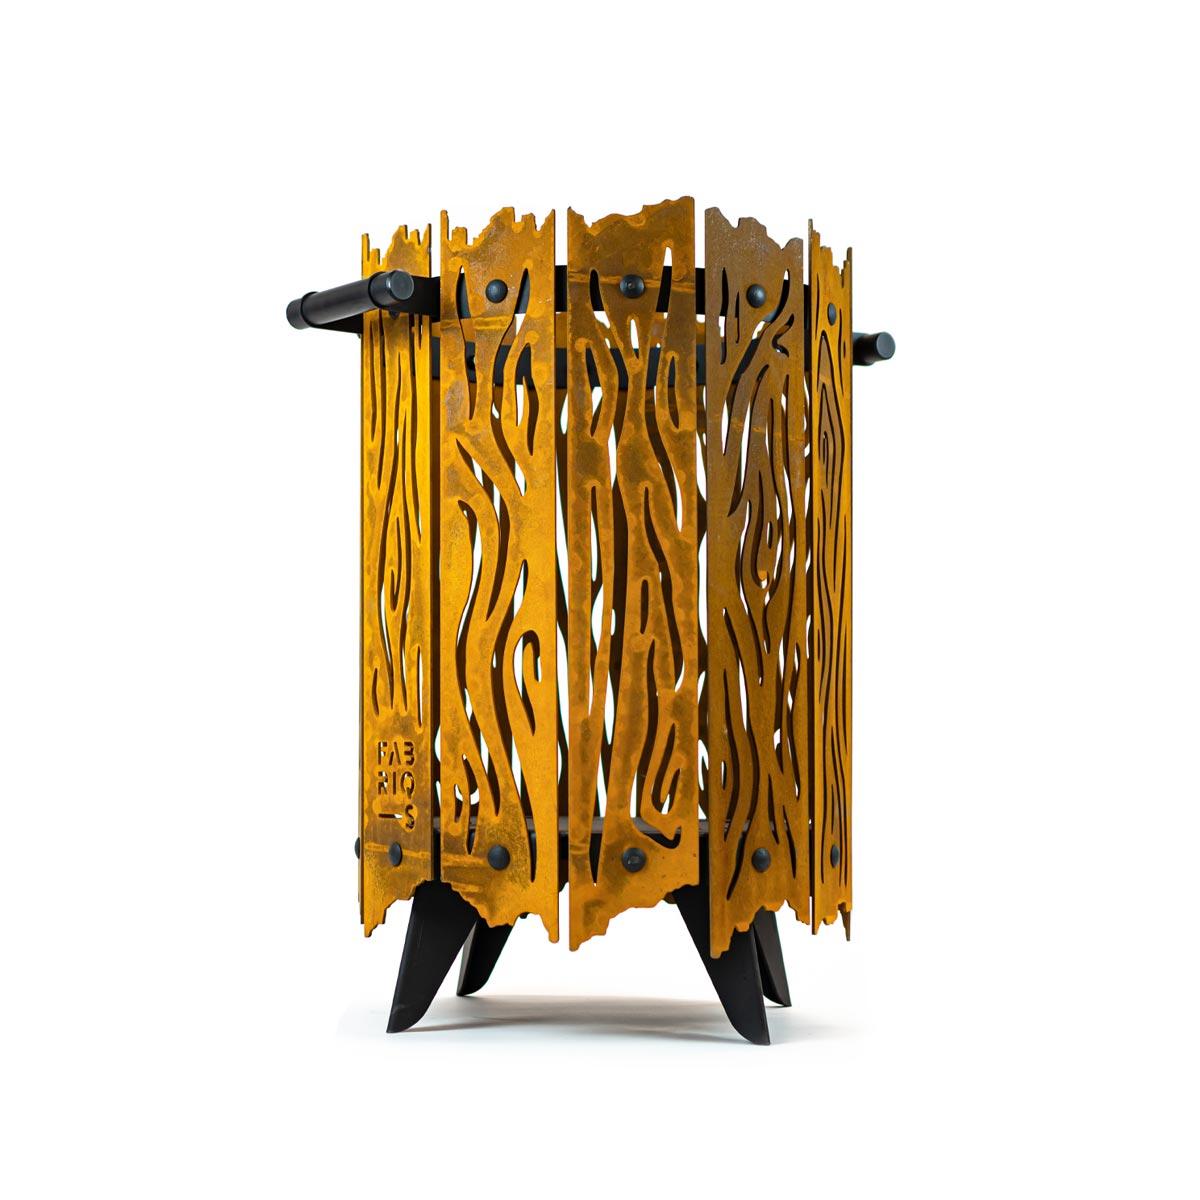 Design vuurkorf Cortenstaal - the roast - Fabriq-S - productfoto main